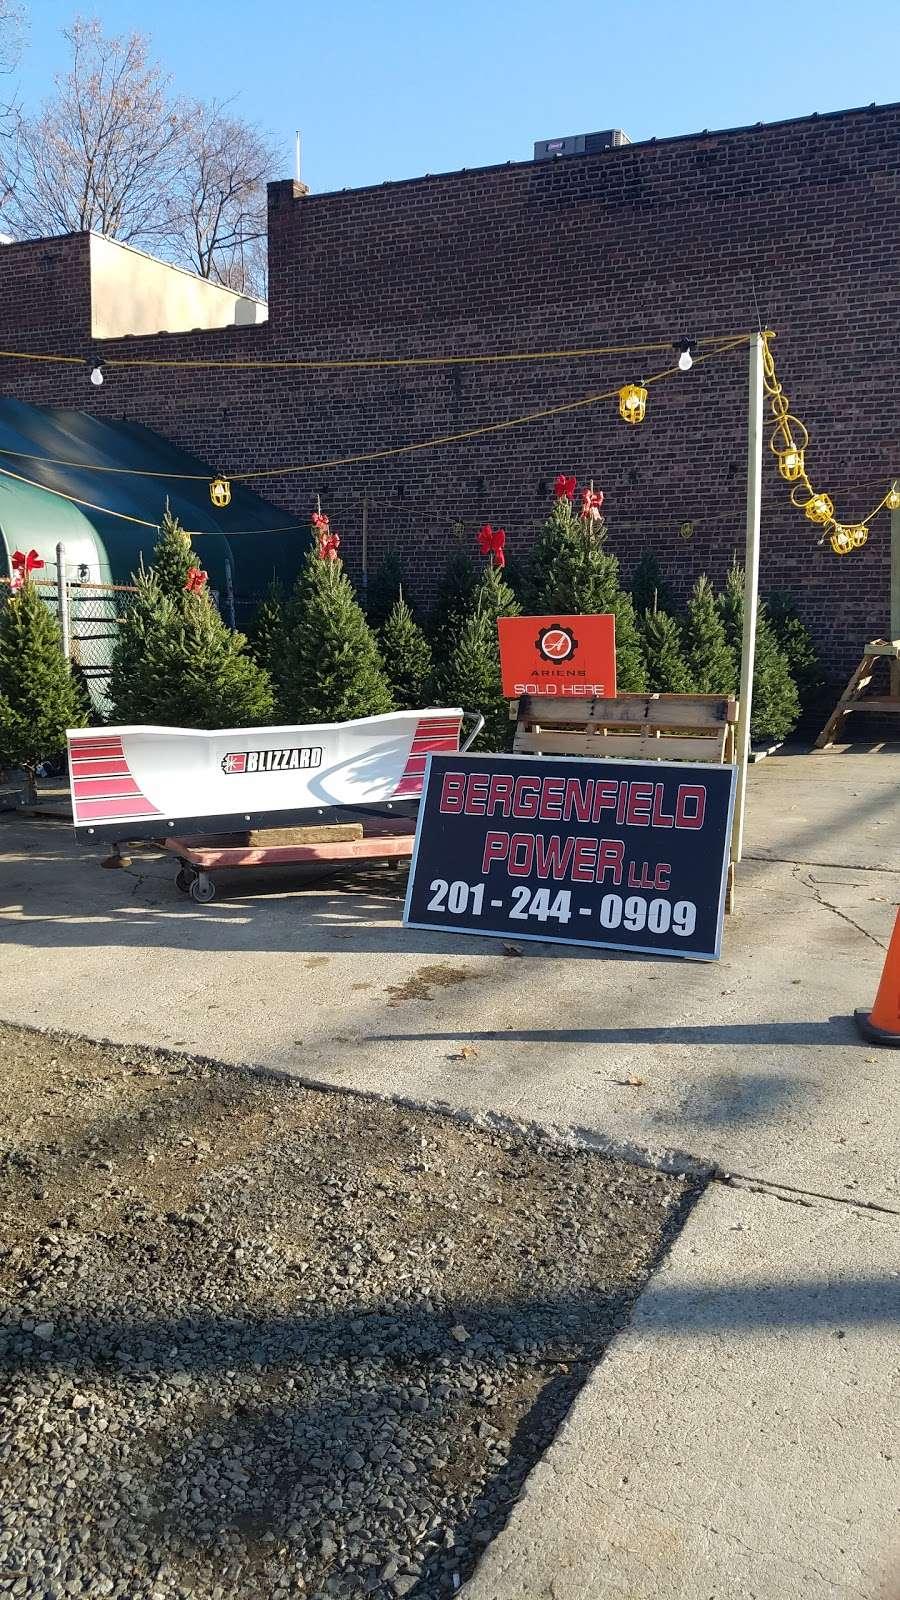 Bergenfield Power LLC - store  | Photo 2 of 5 | Address: 95 W Main St, Bergenfield, NJ 07621, USA | Phone: (201) 244-0909